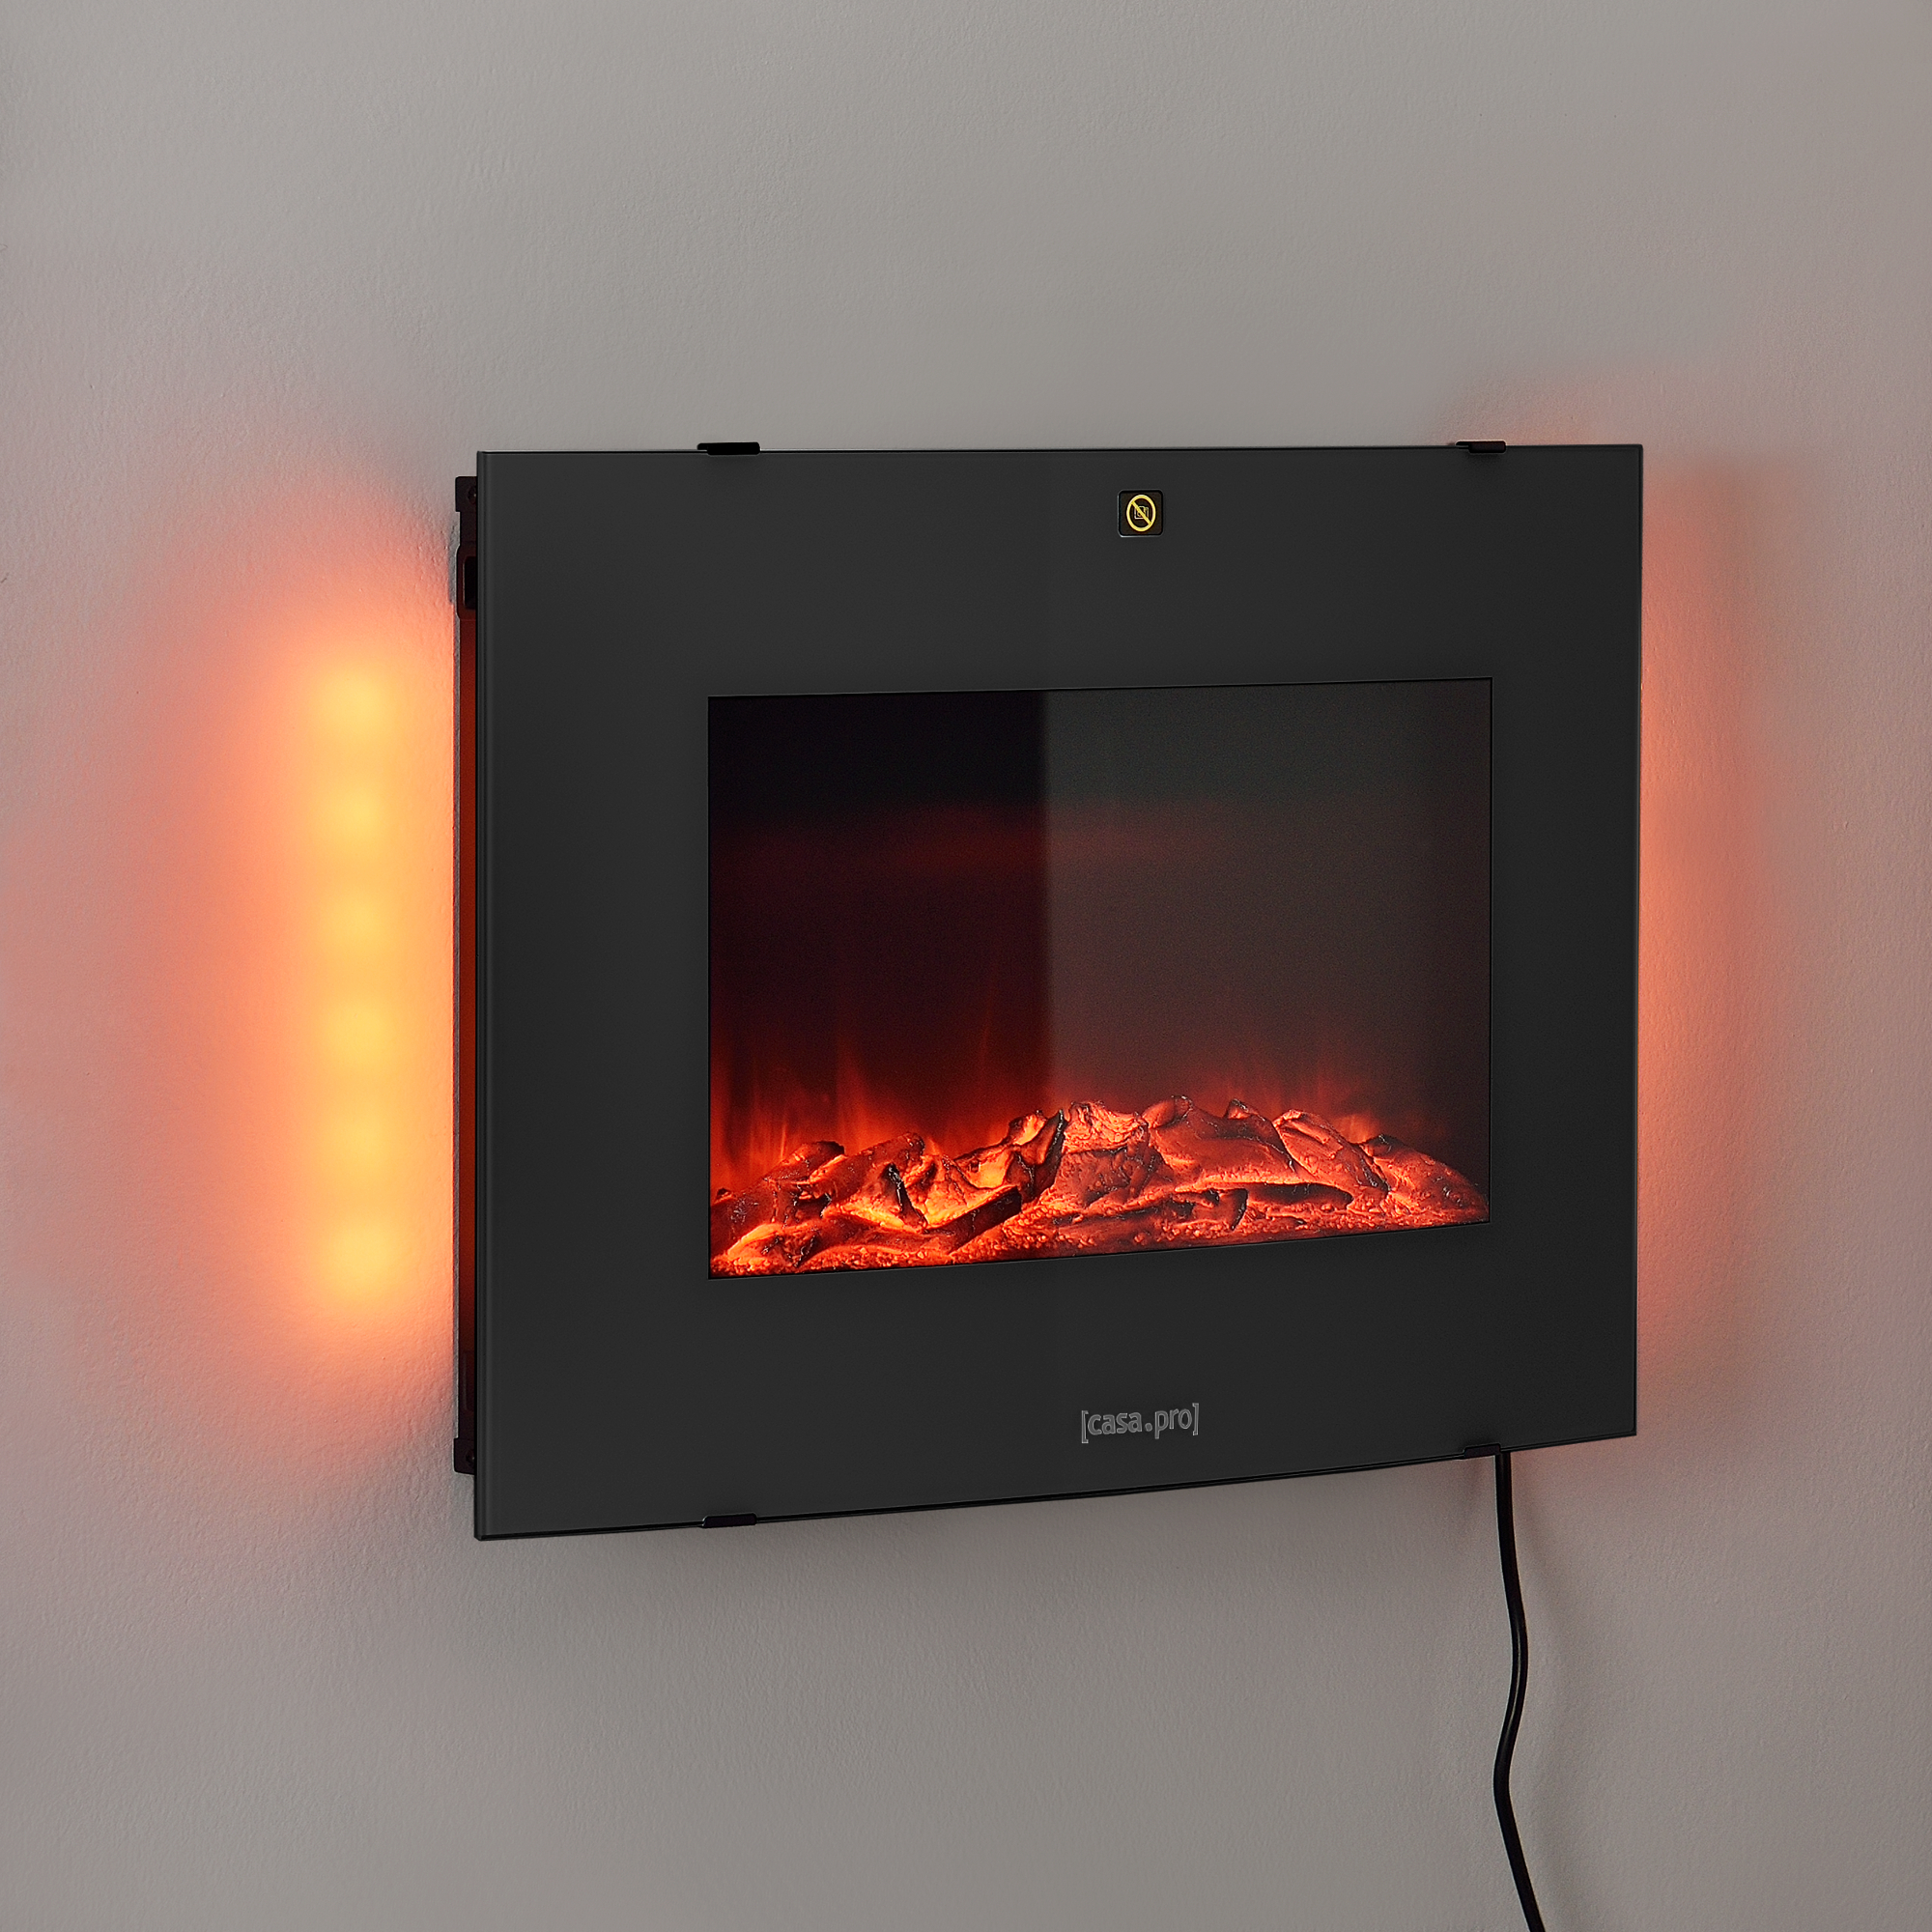 elektrischer kamin wohnzimmer kamin ofen heizung heiz l fter led beleuchtung ebay. Black Bedroom Furniture Sets. Home Design Ideas